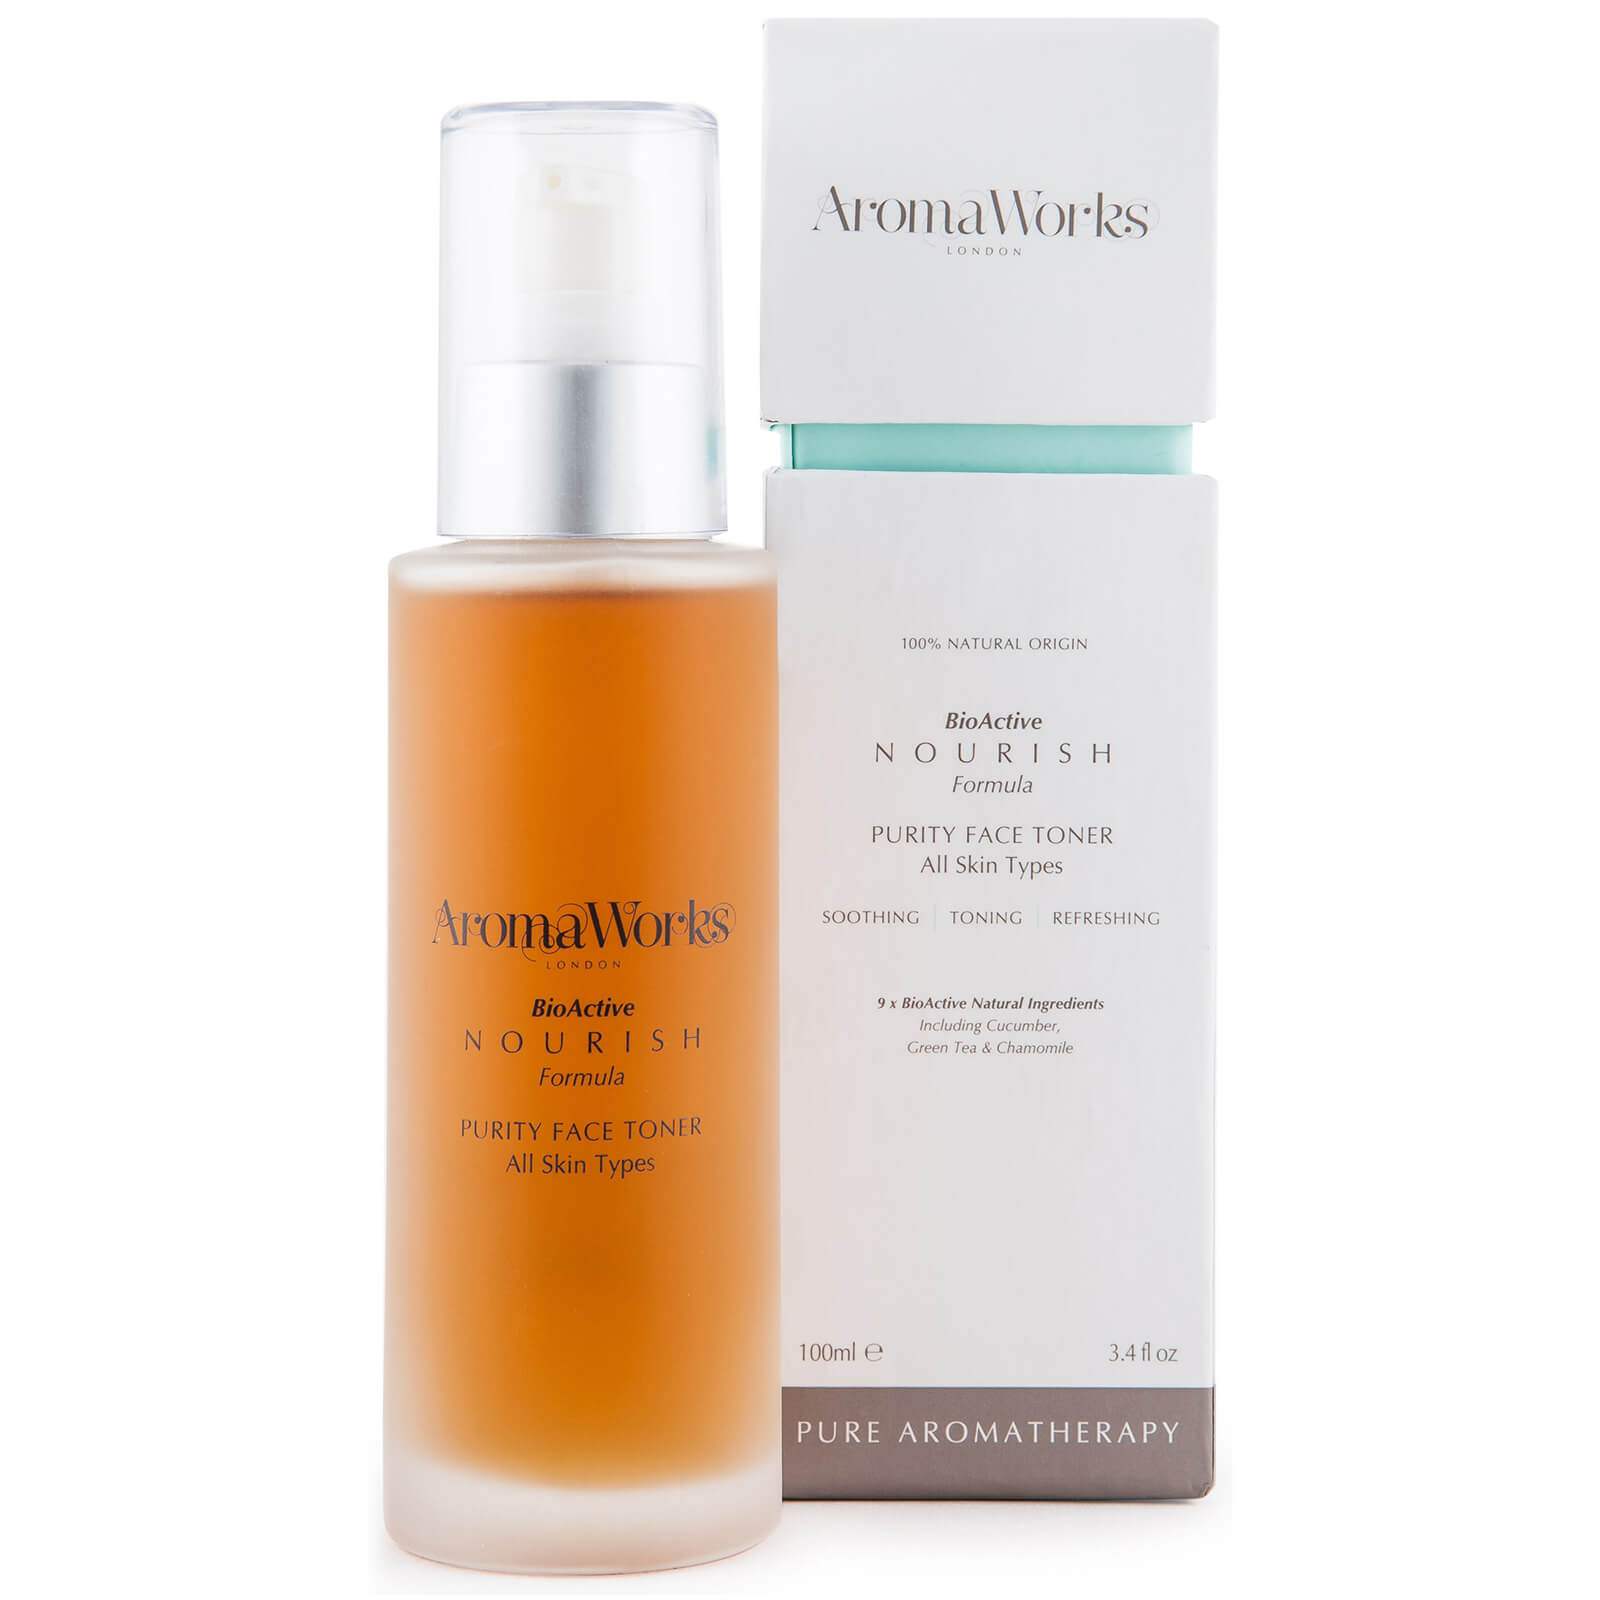 Aromaworks Purity Face Toner 100ml Beautyexpert Nature Republic Herb Blending Product Description